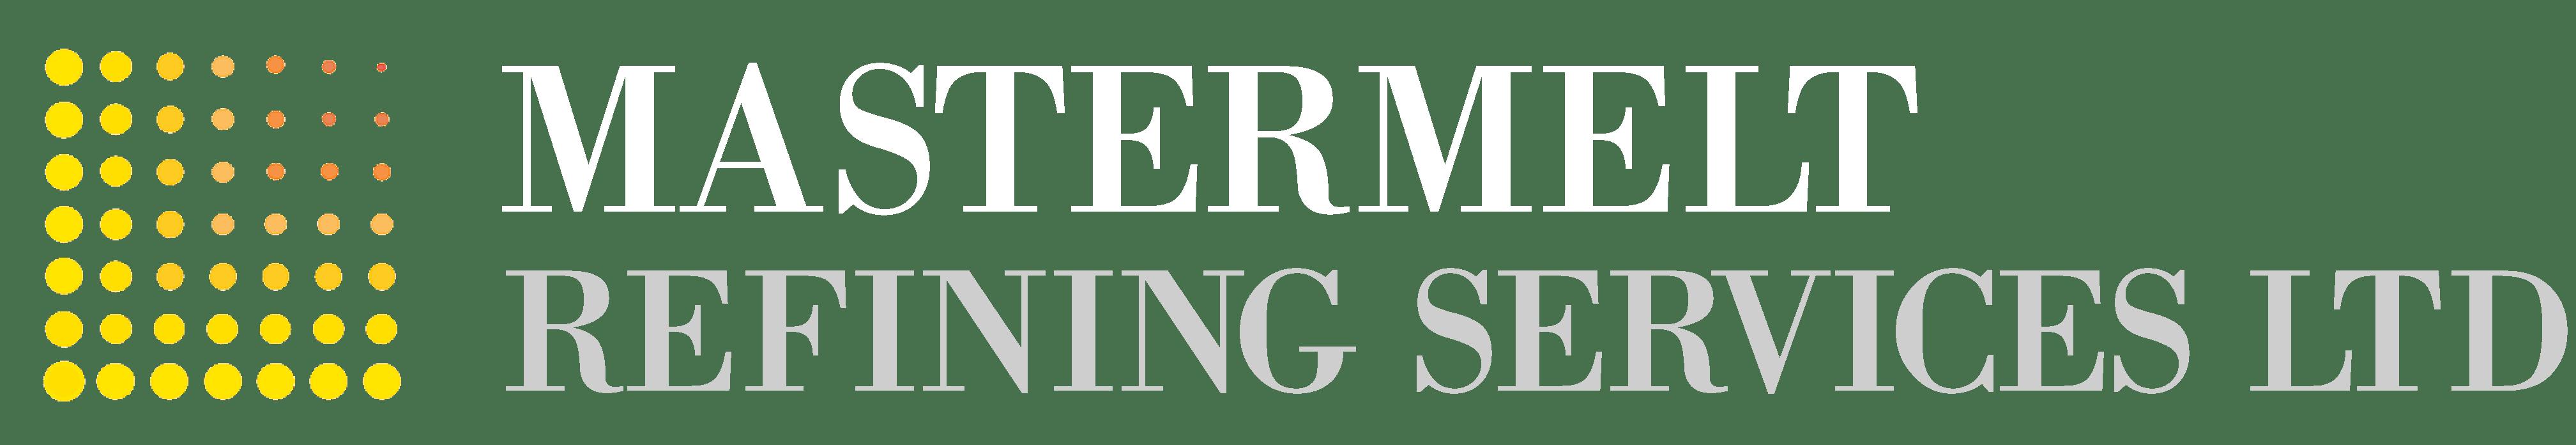 Mastermelt Refining Services Ltd